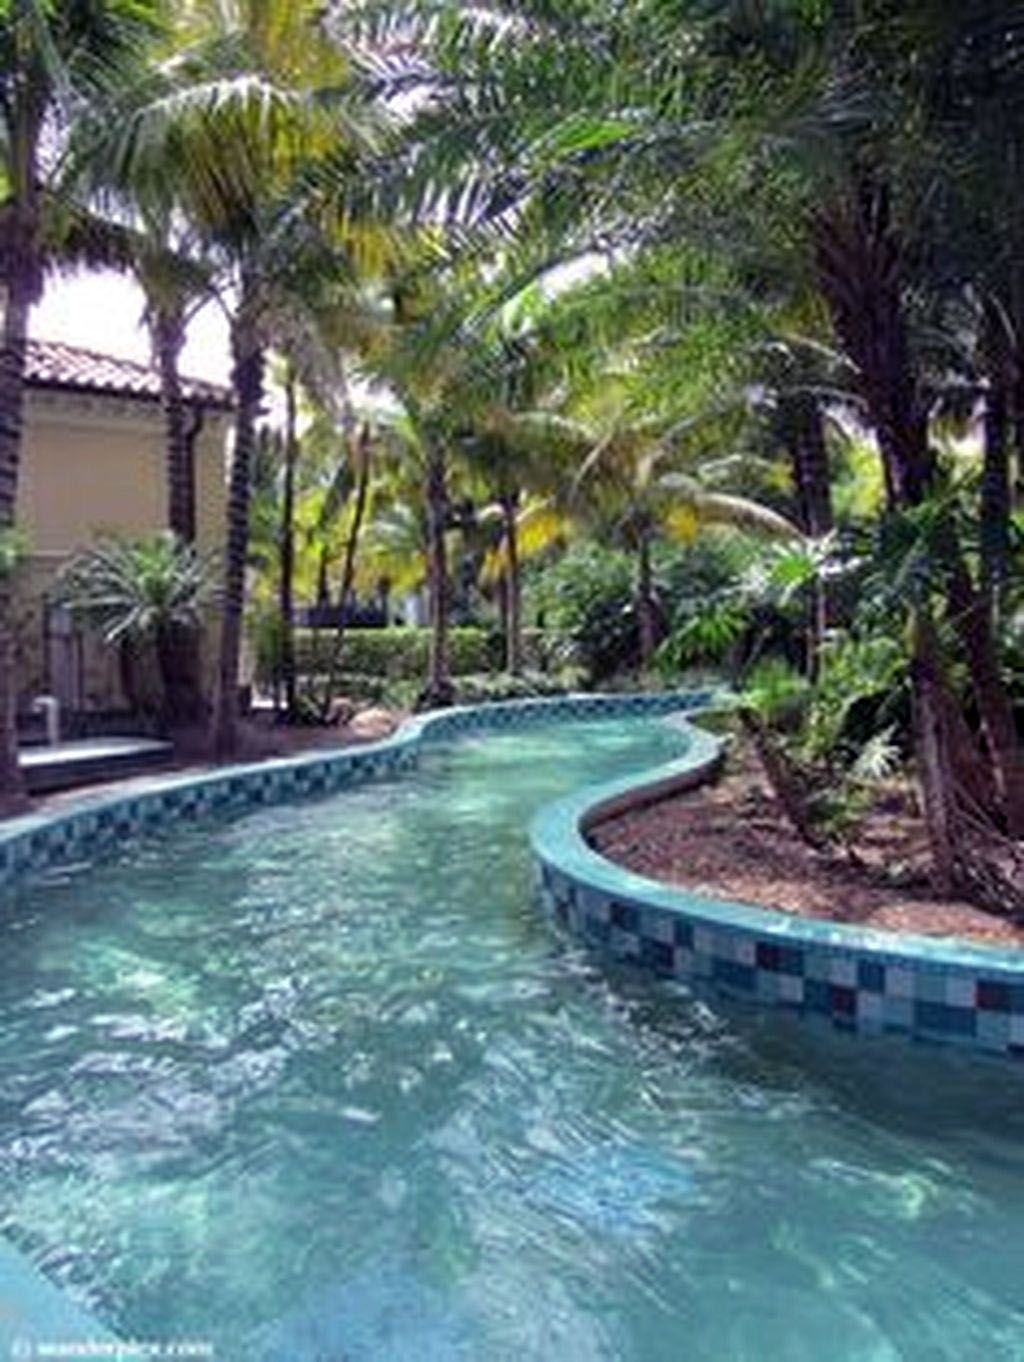 14 Amazing Backyard Pool Ideas Lazy River Pool Dream Pools Backyard Pool